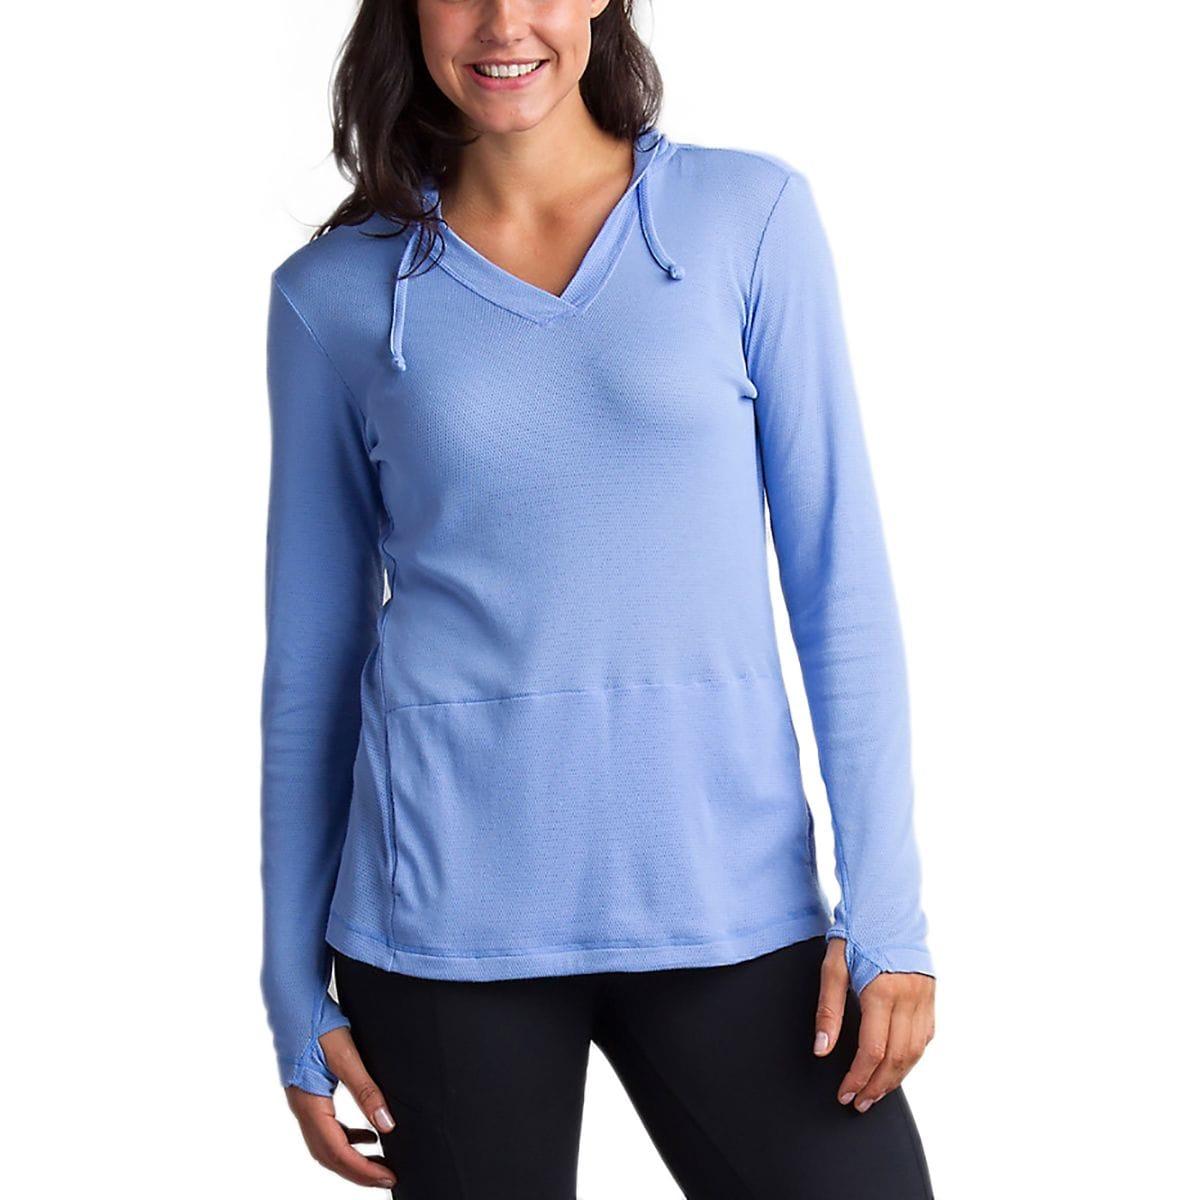 ExOfficio BugsAway Lumen Pullover Hooded Shirt - Women